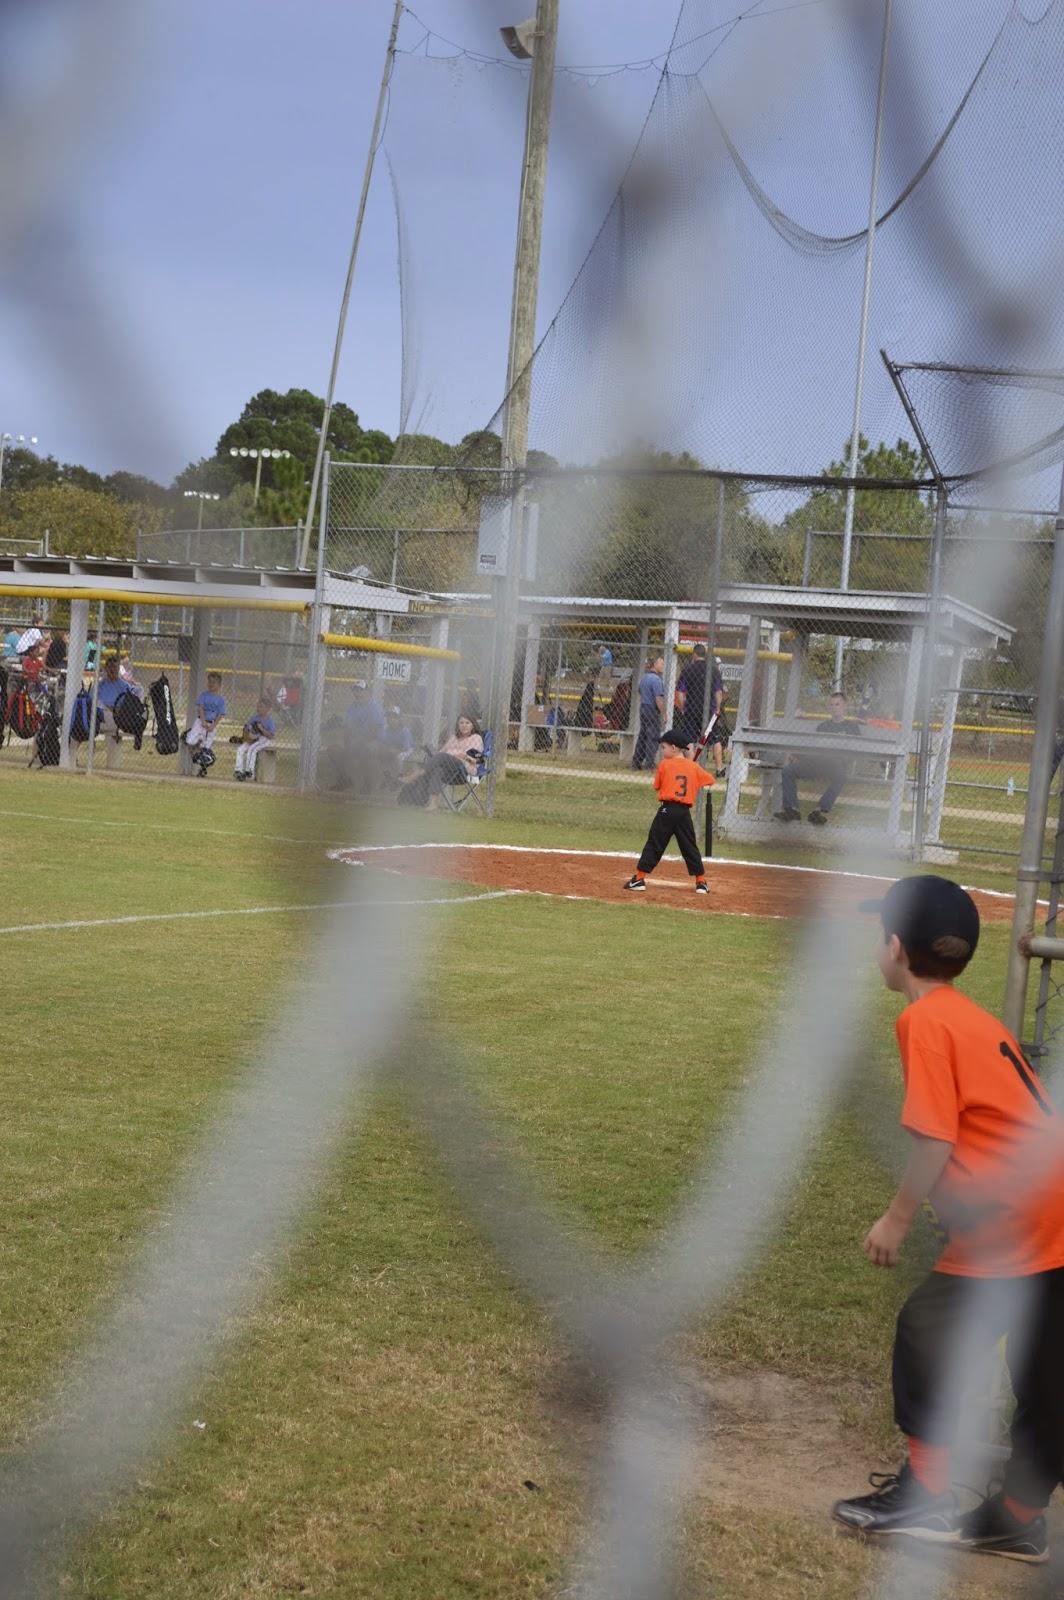 Colt's First Baseball Game!